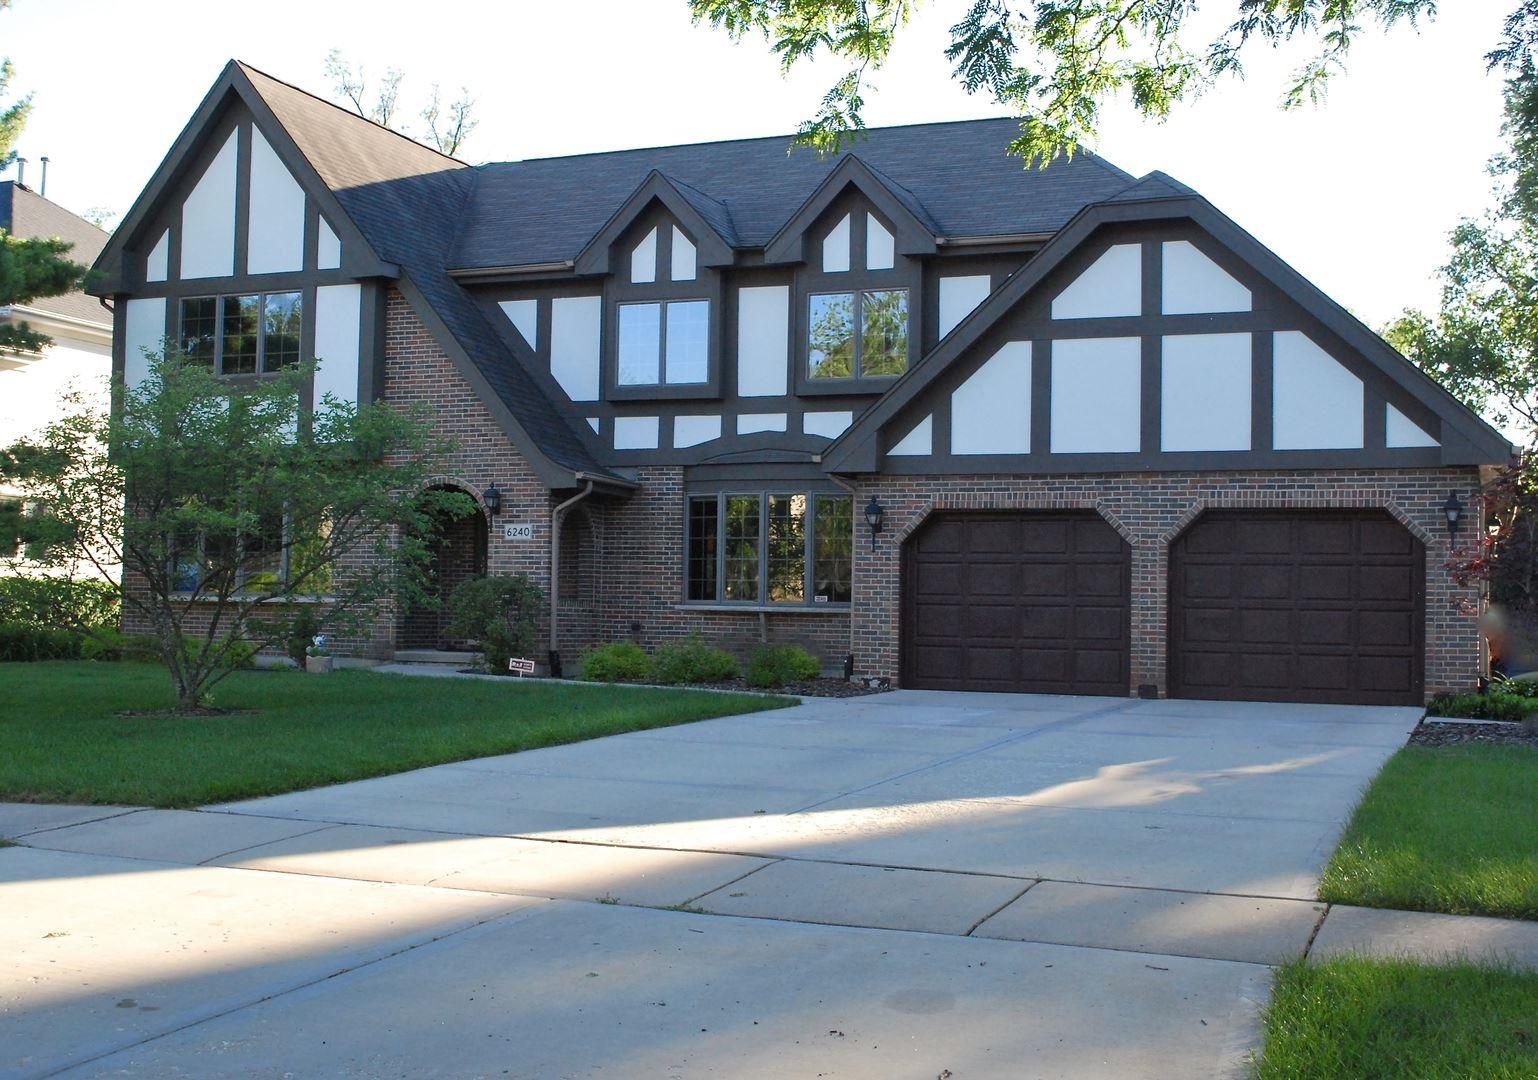 6240 Squire Lane, Willowbrook, IL 60527 - #: 10733324